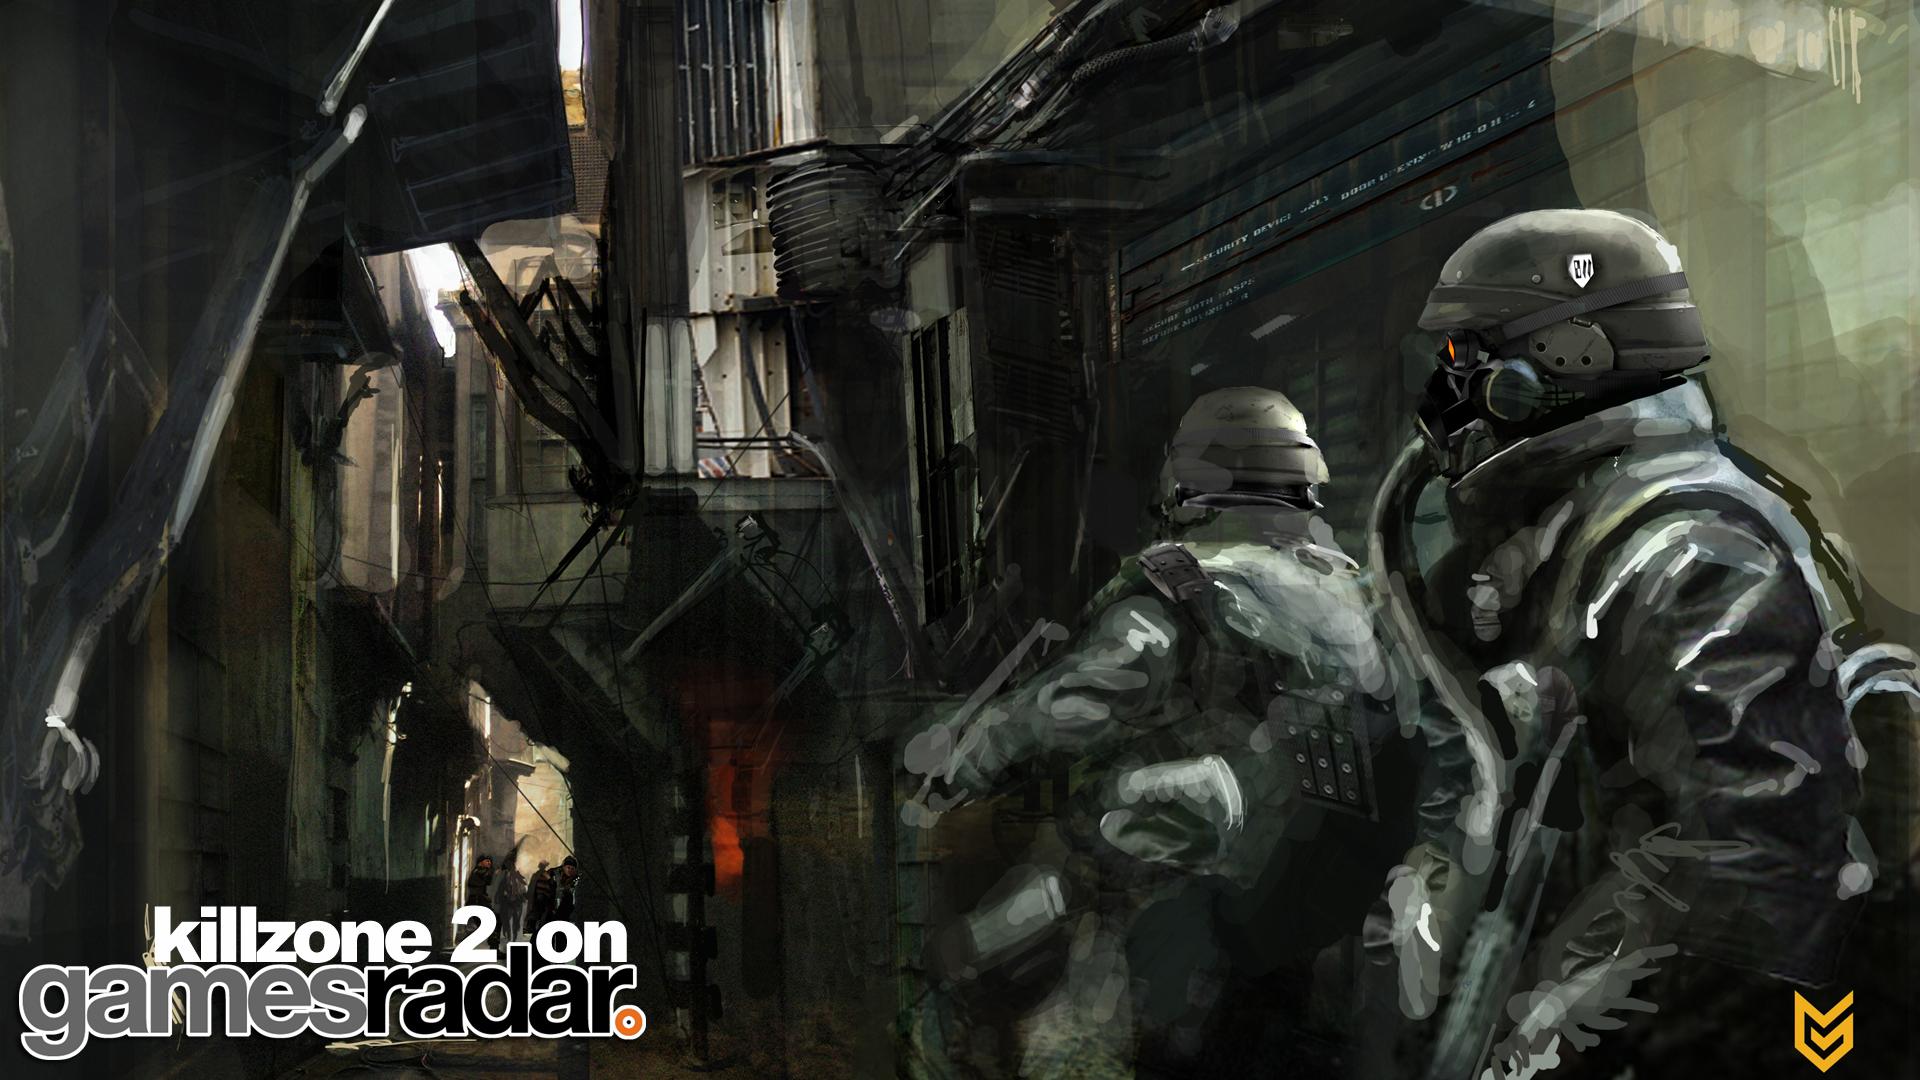 Killzone2, archive, paper, supply, wallpaper, gamesradar, further, unlock,